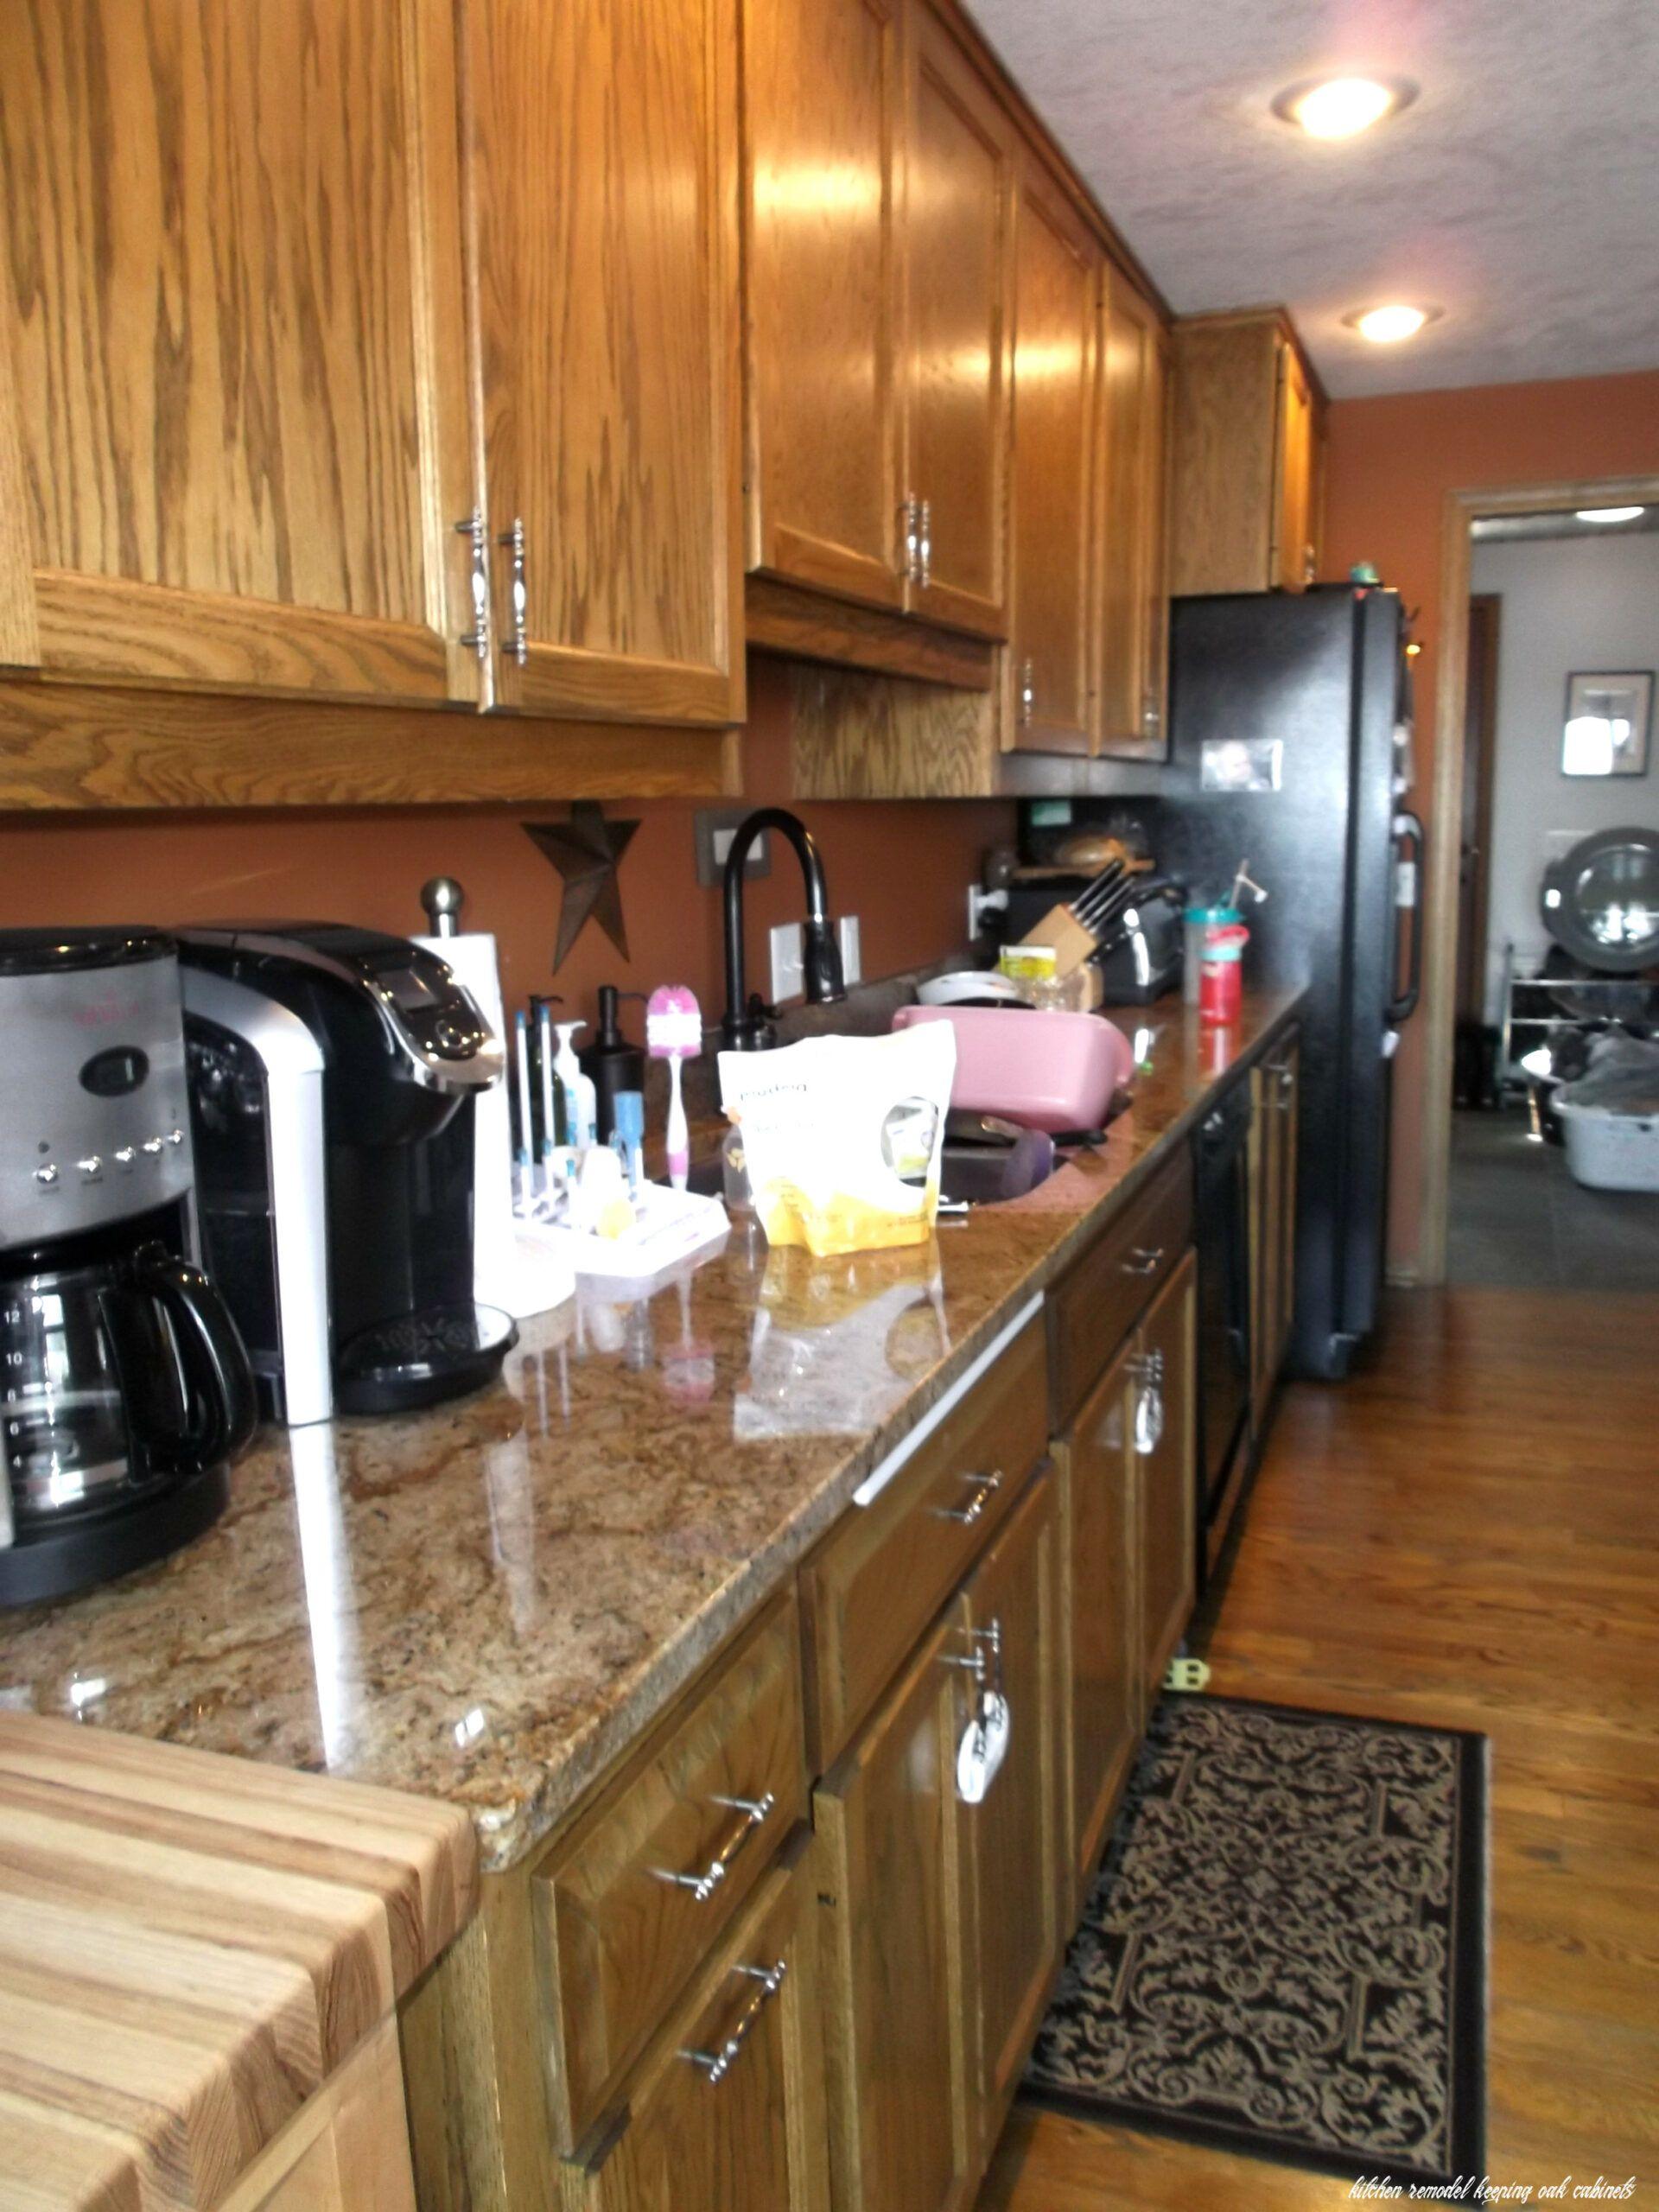 Kitchen Remodel Keeping Oak Cabinets Kitchenremodelkeepingoakcabinets In 2020 Kitchen Remodel Newly Remodeled Kitchens Oak Kitchen Cabinets